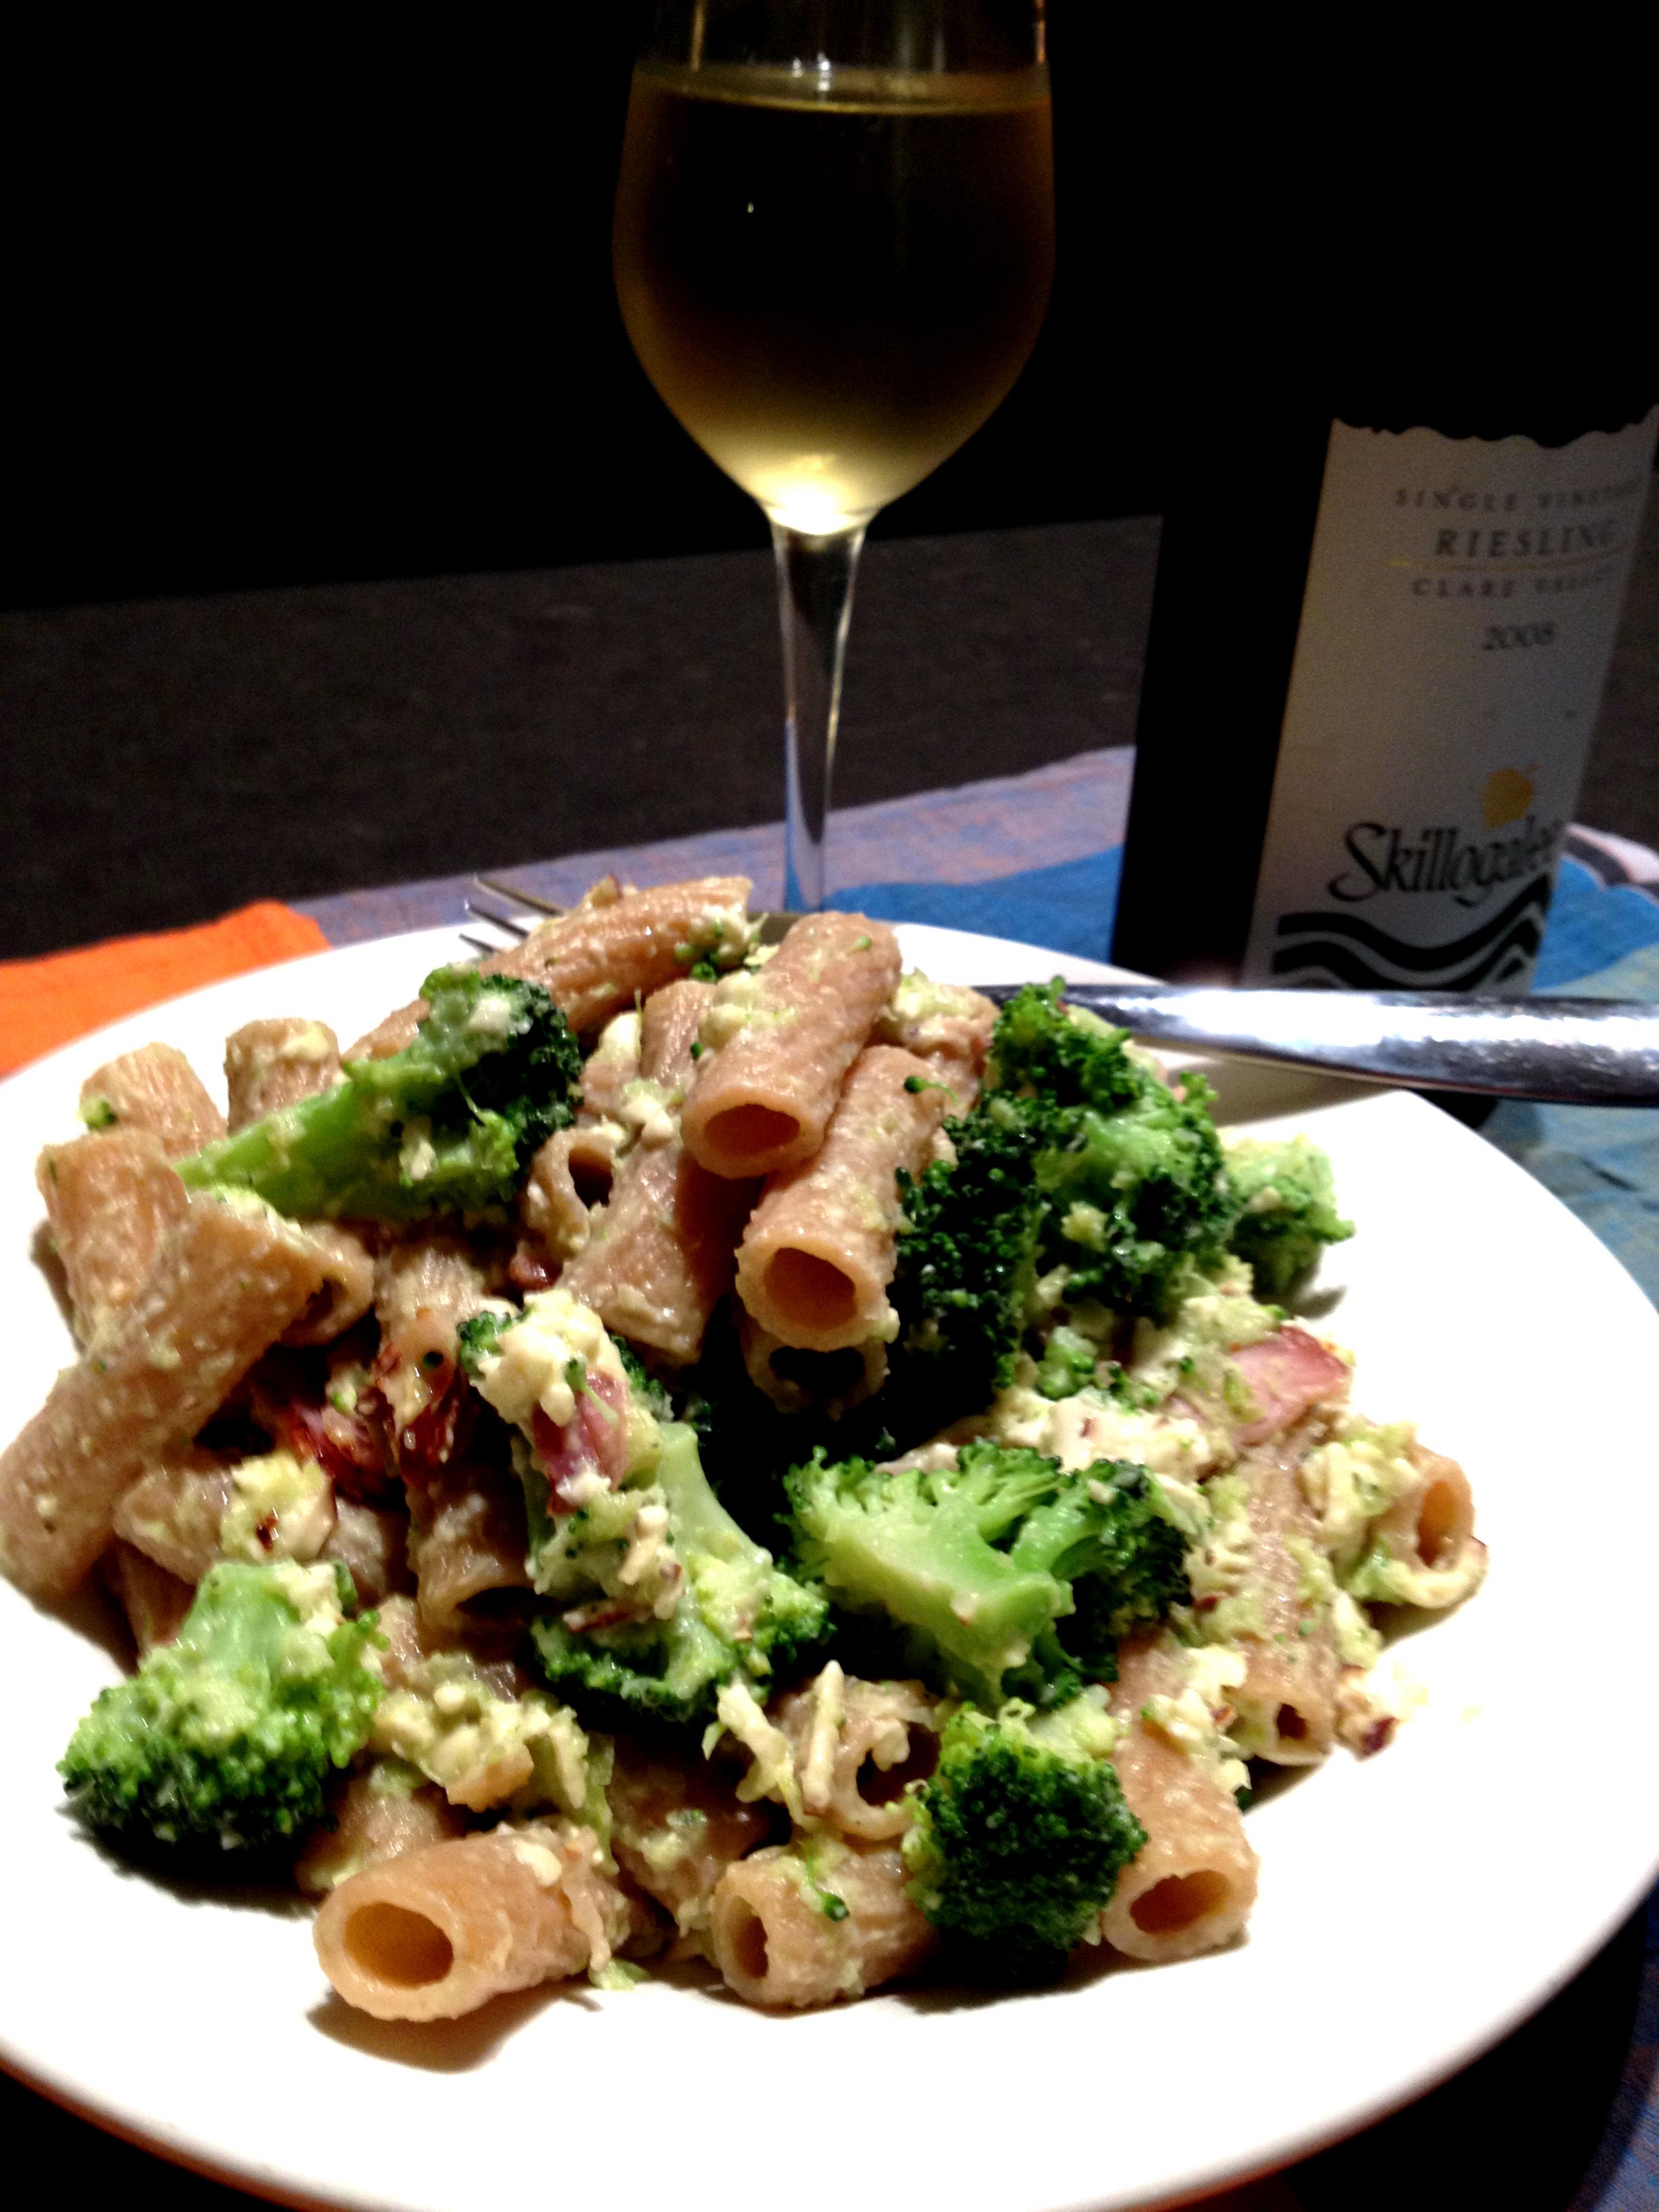 Sweet and light cookbook based on - Binge On Broccoli Please Pass The Recipe